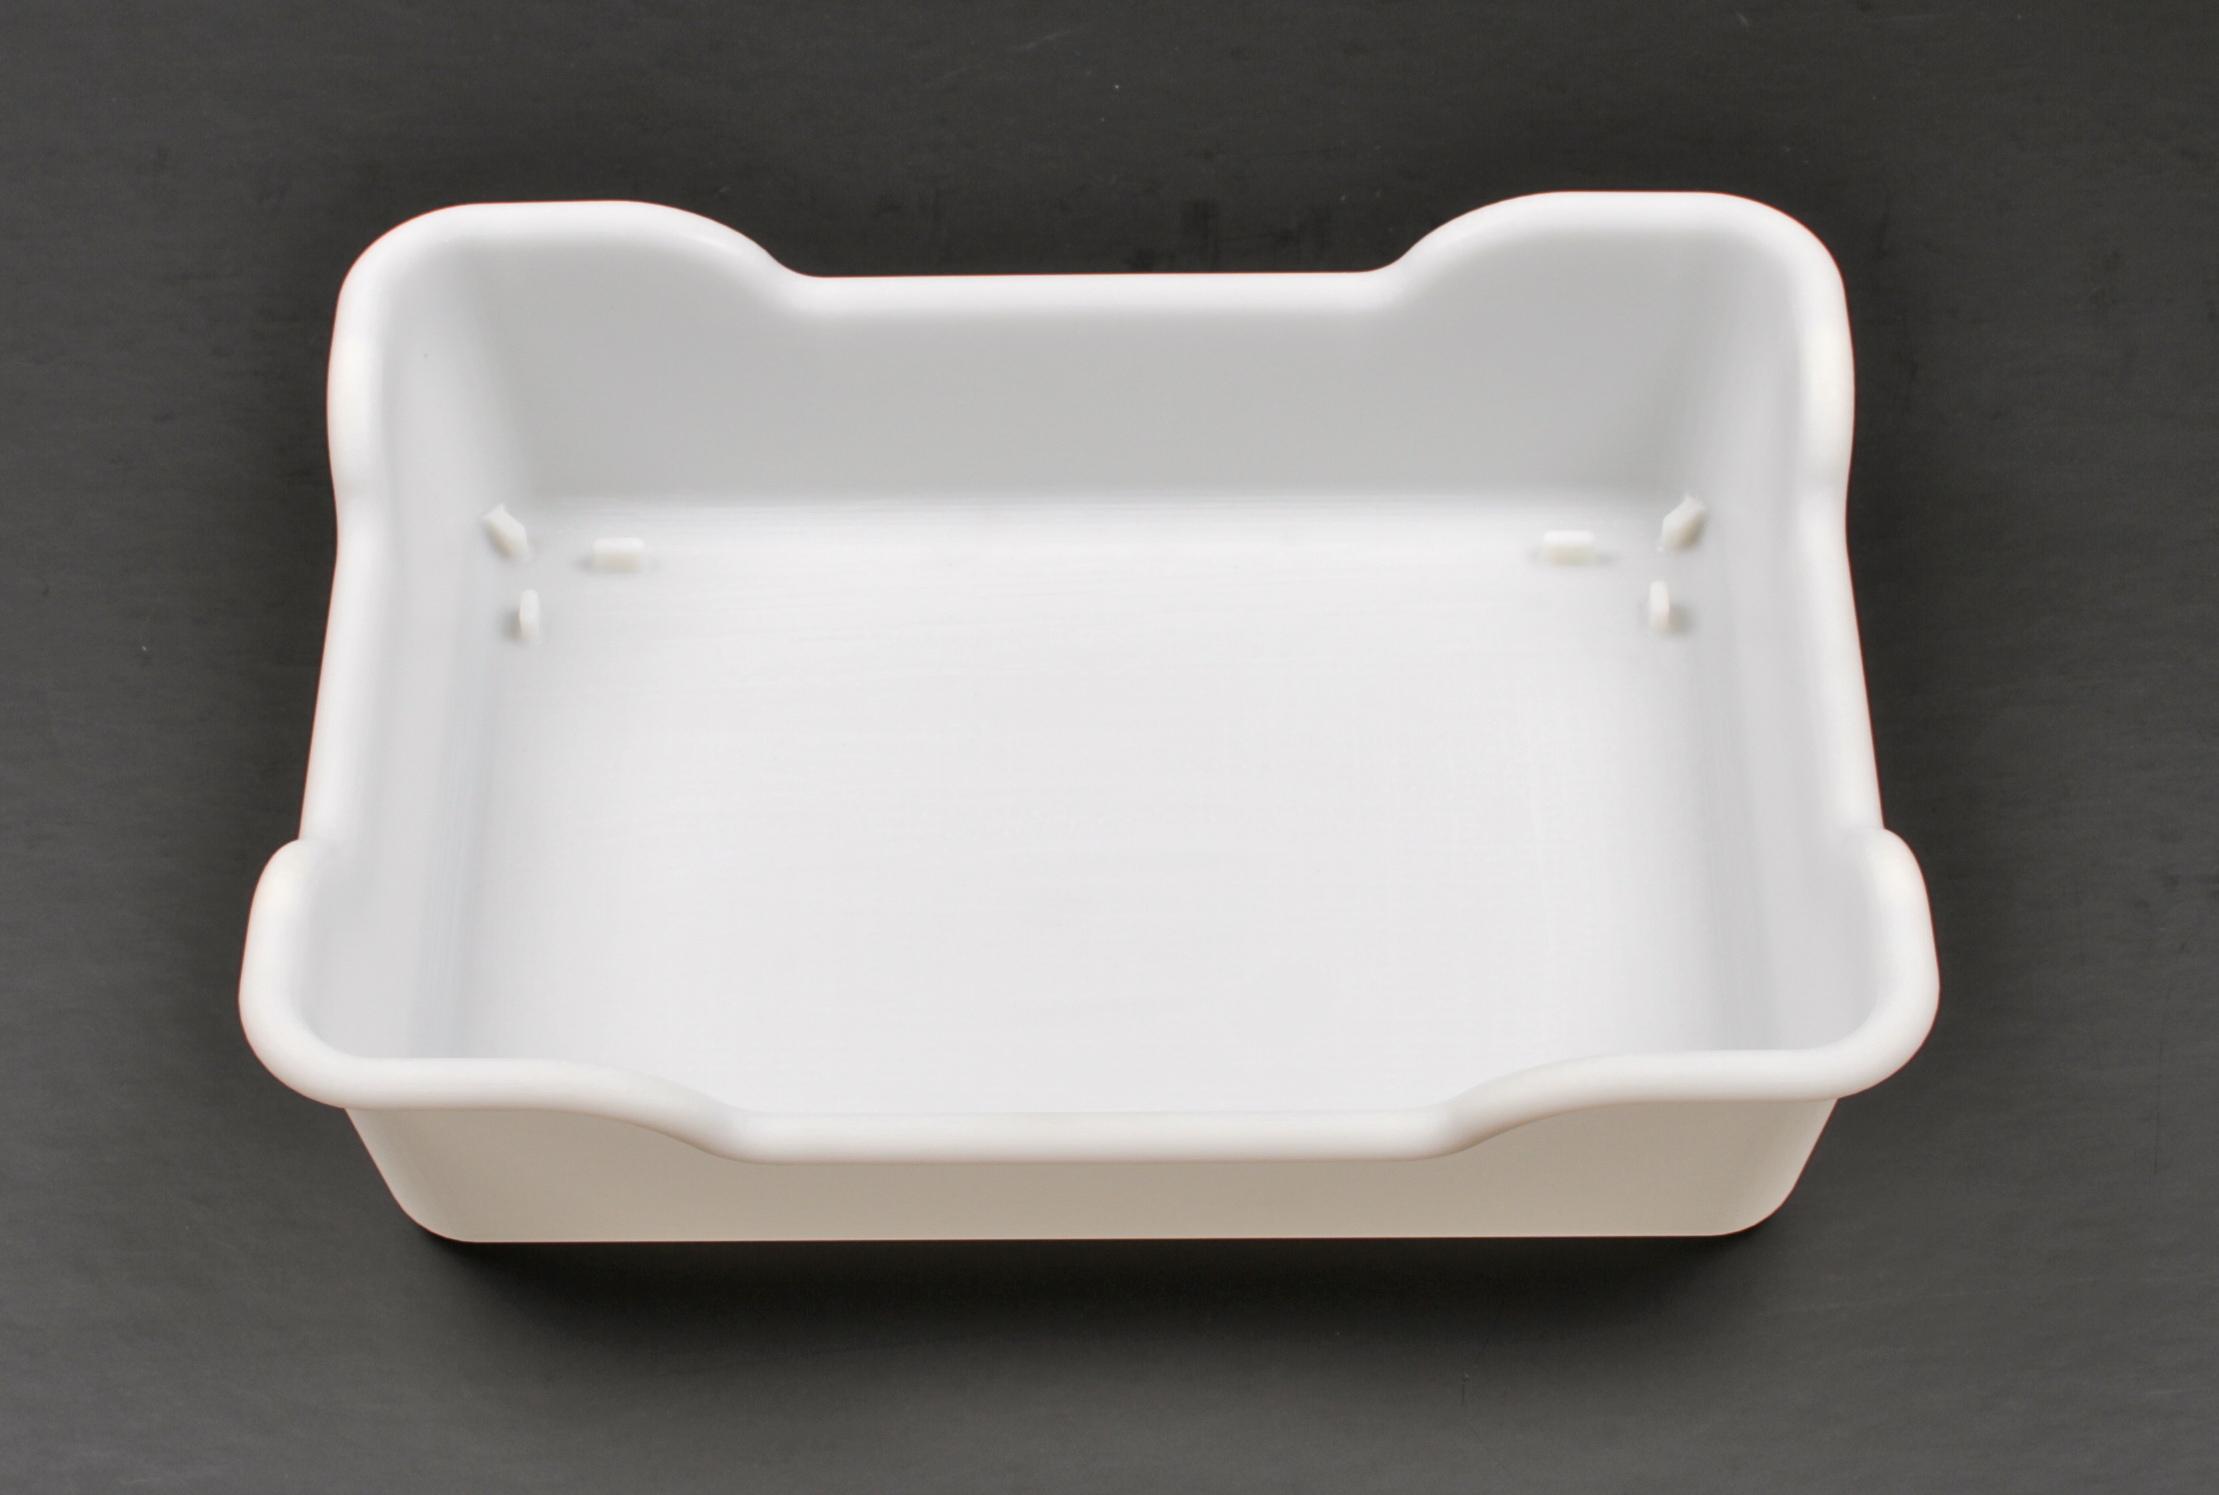 Boon Drying Rack Dishwasher Safe Boon Lawn Countertop